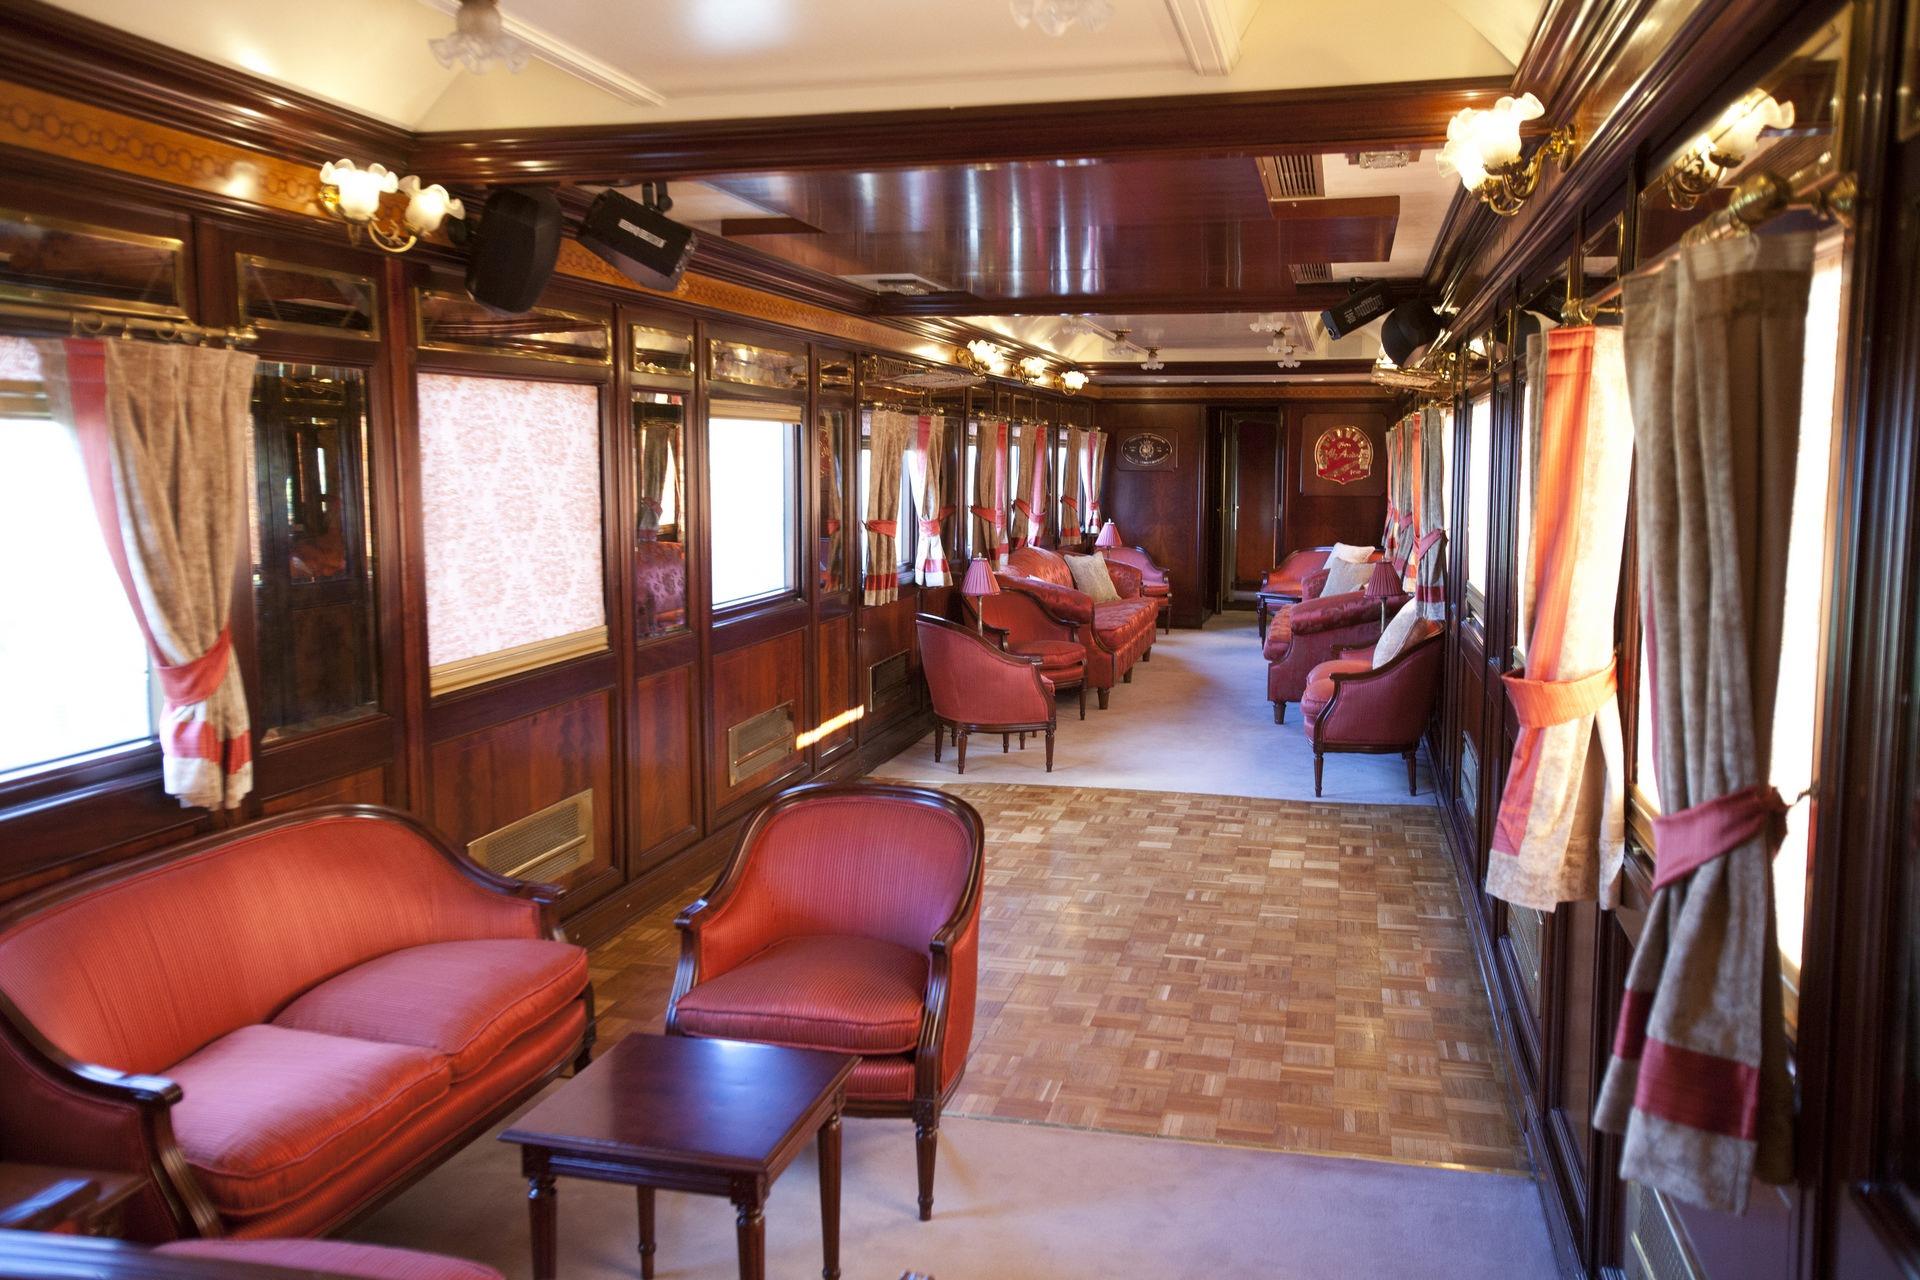 NOMAD-luksusowe-pociągi-w-Hiszpani-Al-Andalus-11